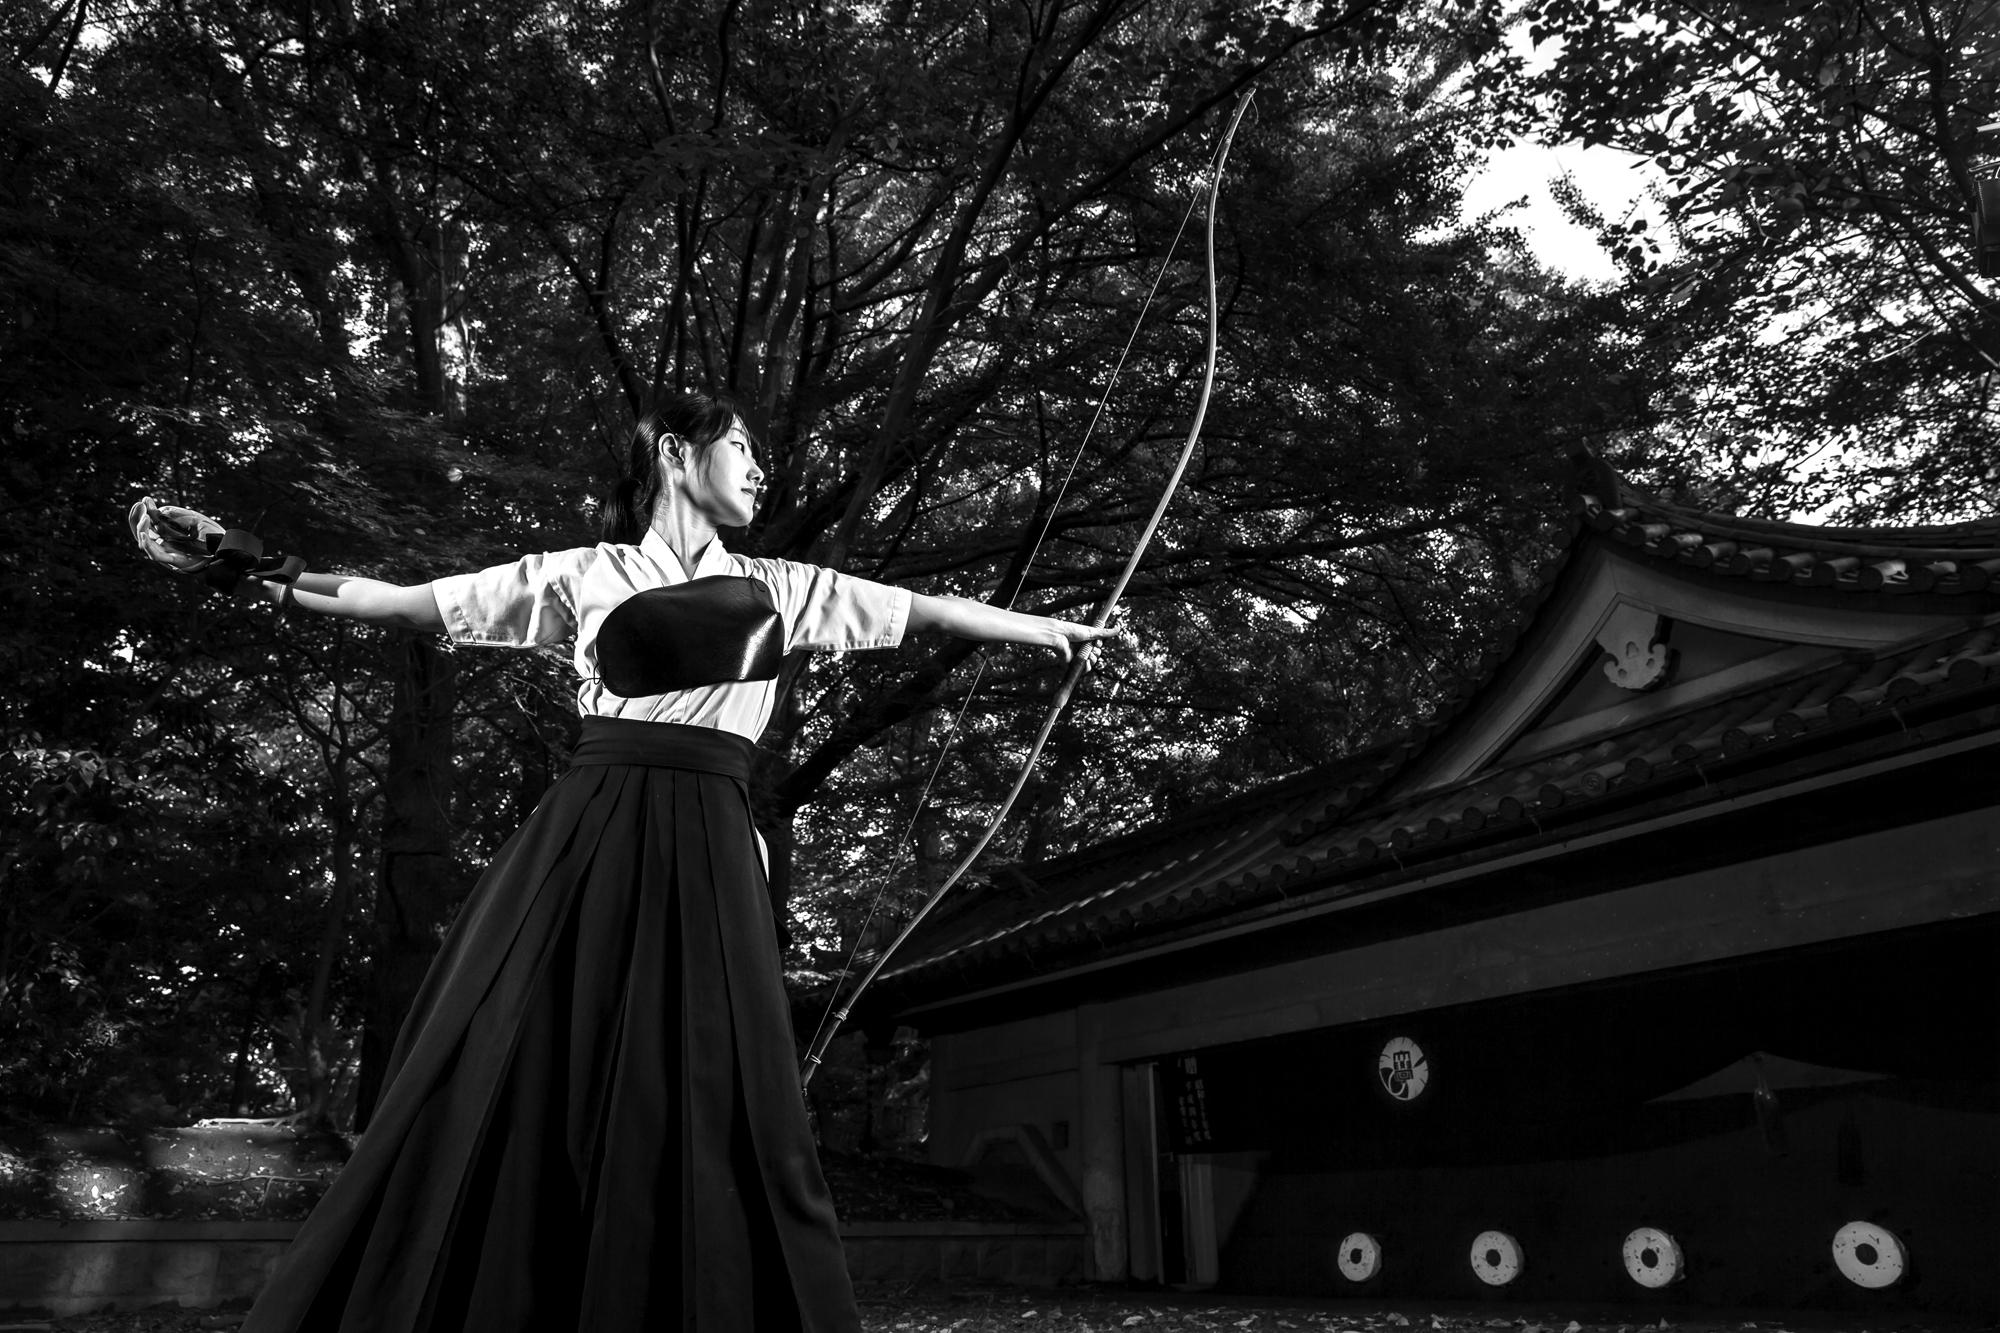 The Last Samurai By Brent Stirton World Photography Organisation